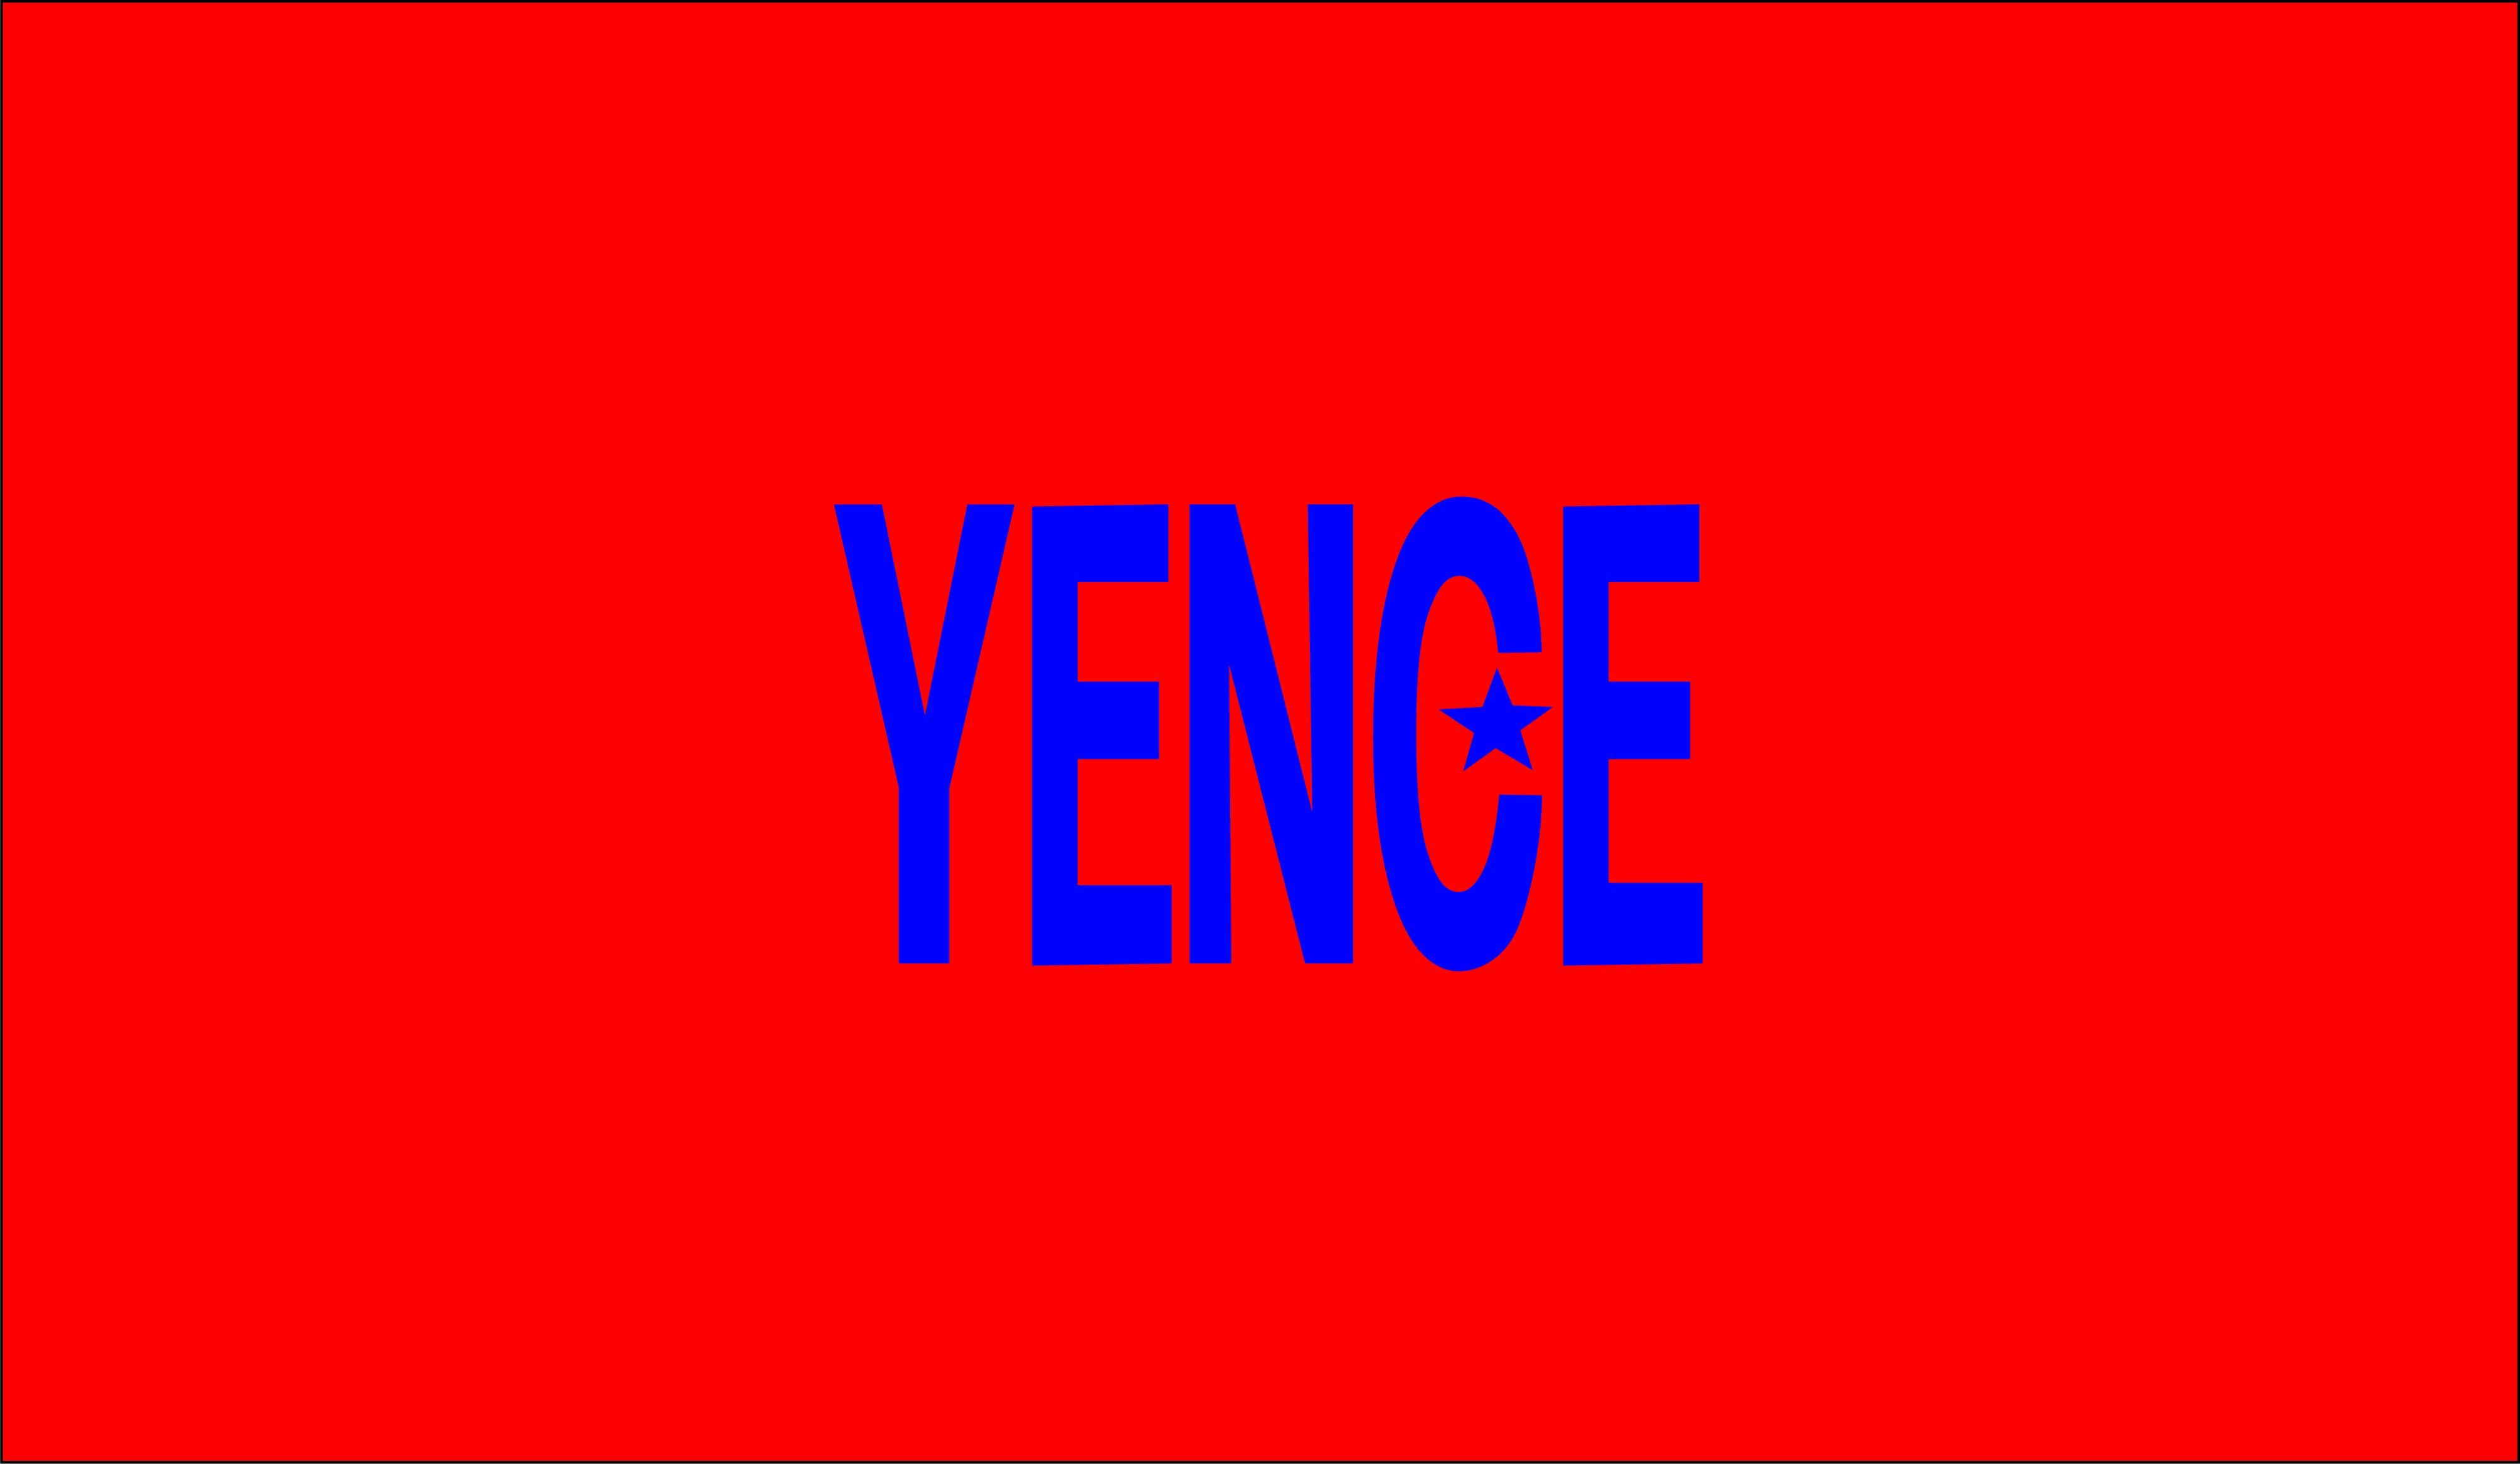 YENCE — DIPLOM Jens Wagner Call for Creatives